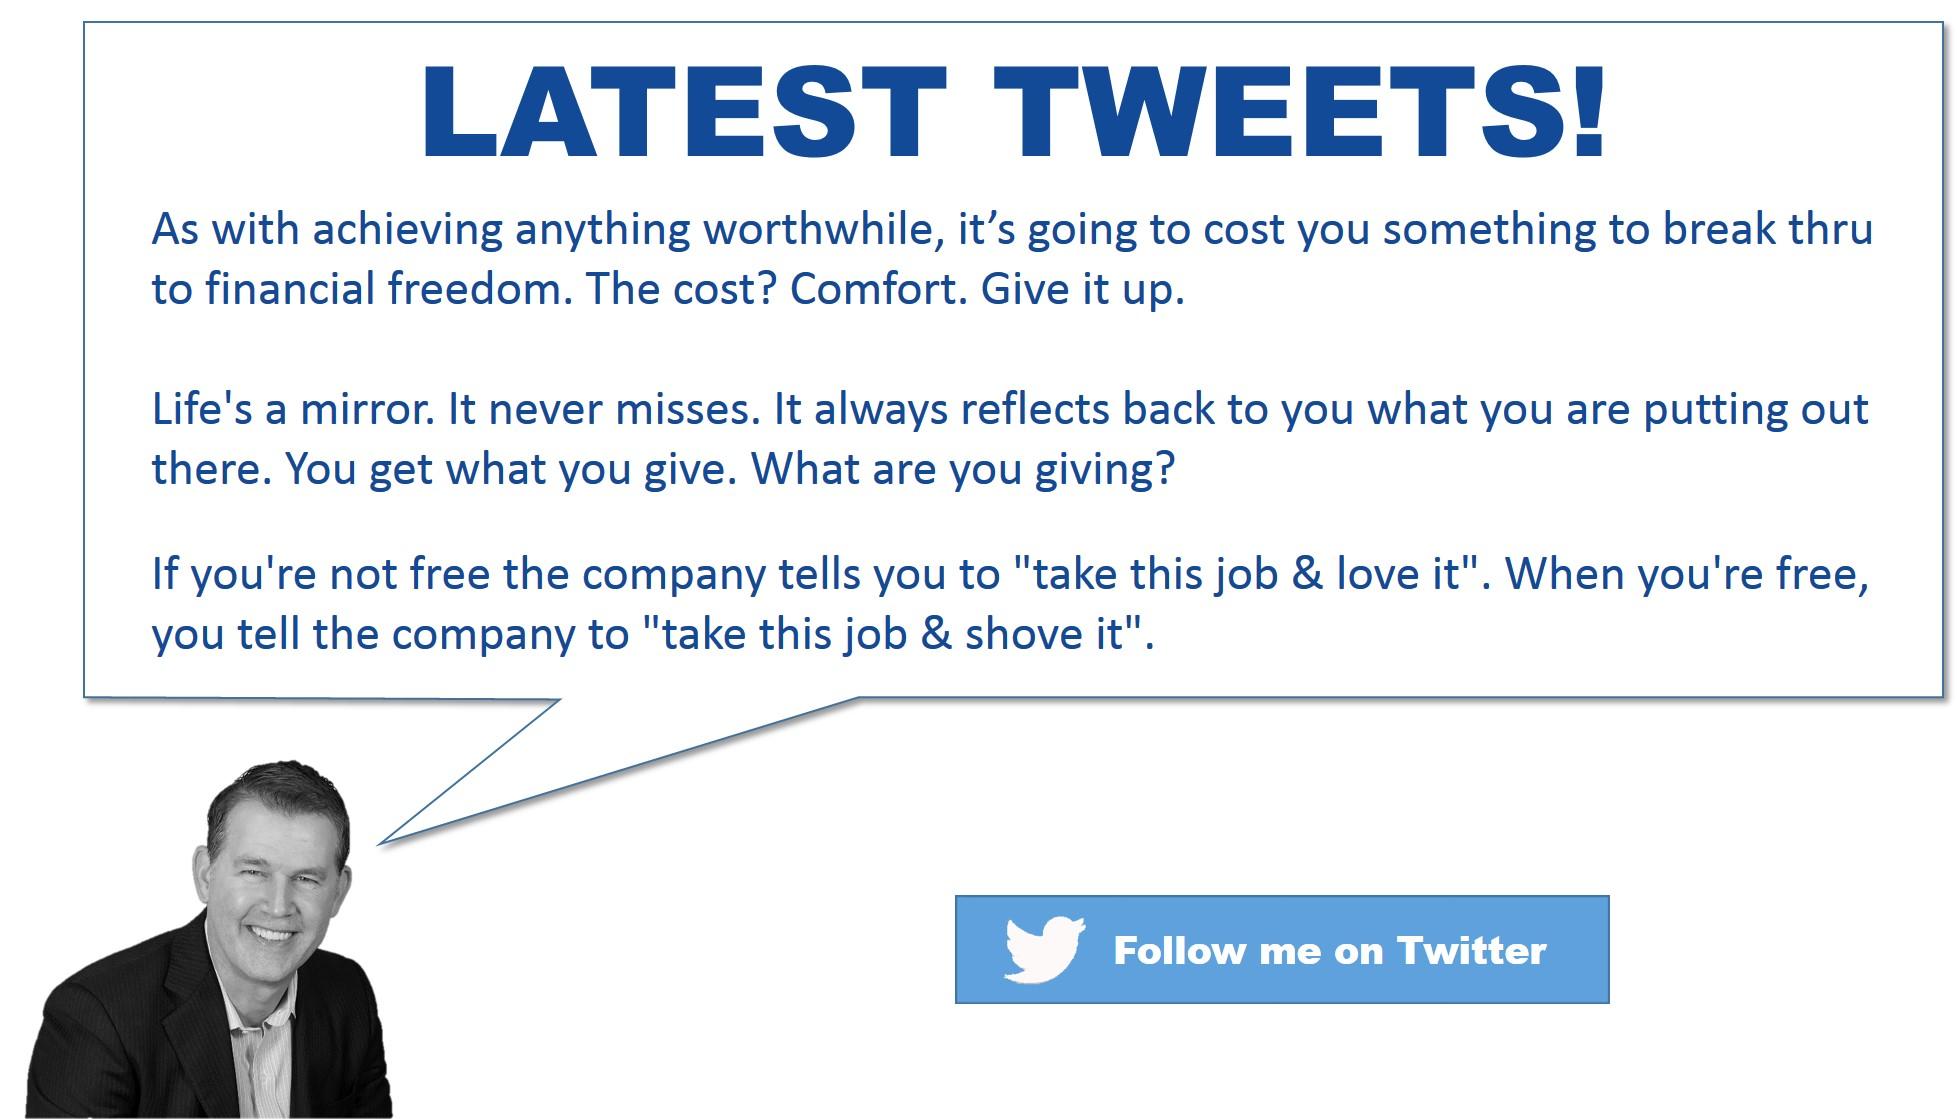 MontyCampbell-Tweets-4-8-17